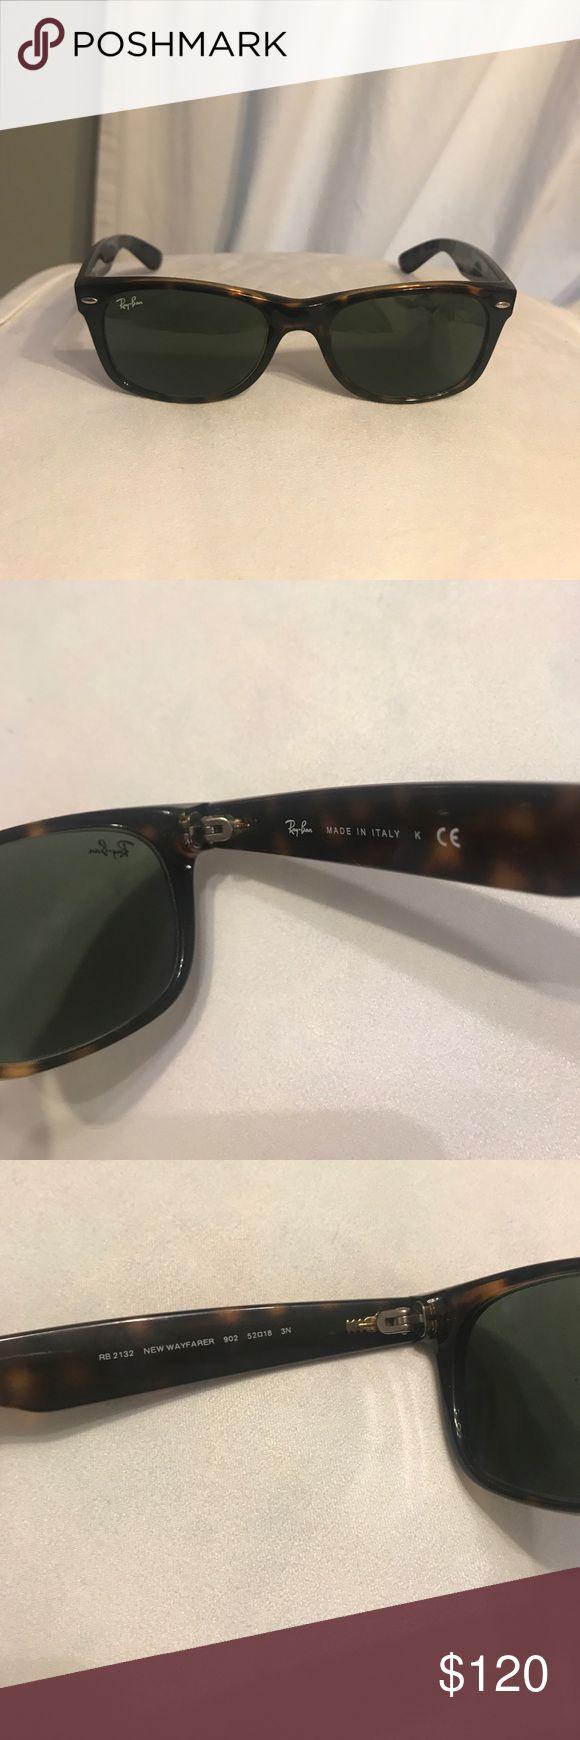 Ray-Ban NEVER WORN Sunglasses NEWWAYFARER *NEVER WORN* RB2132 New Wayfarer 902 52-18 Tortoise frame/ black lenses Ray-Ban Accessories Sunglasses